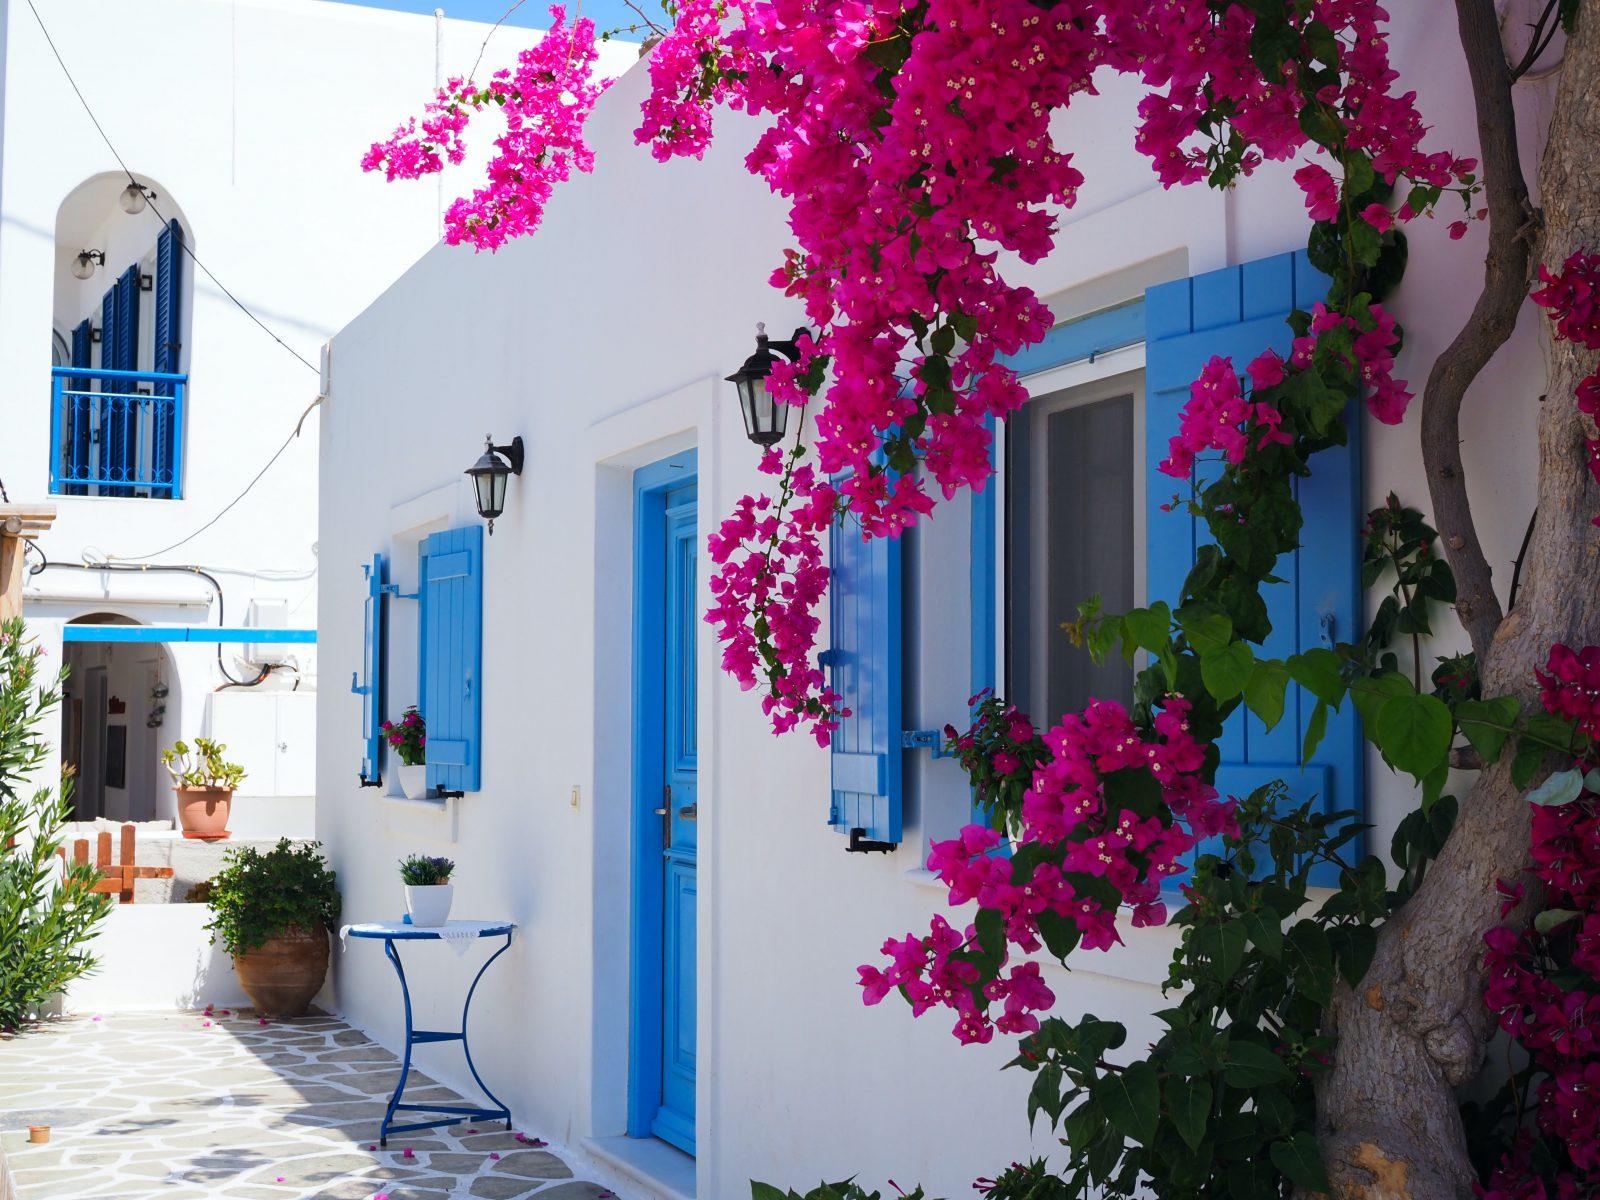 Grčka, evropska putovanja, Solun, Atina